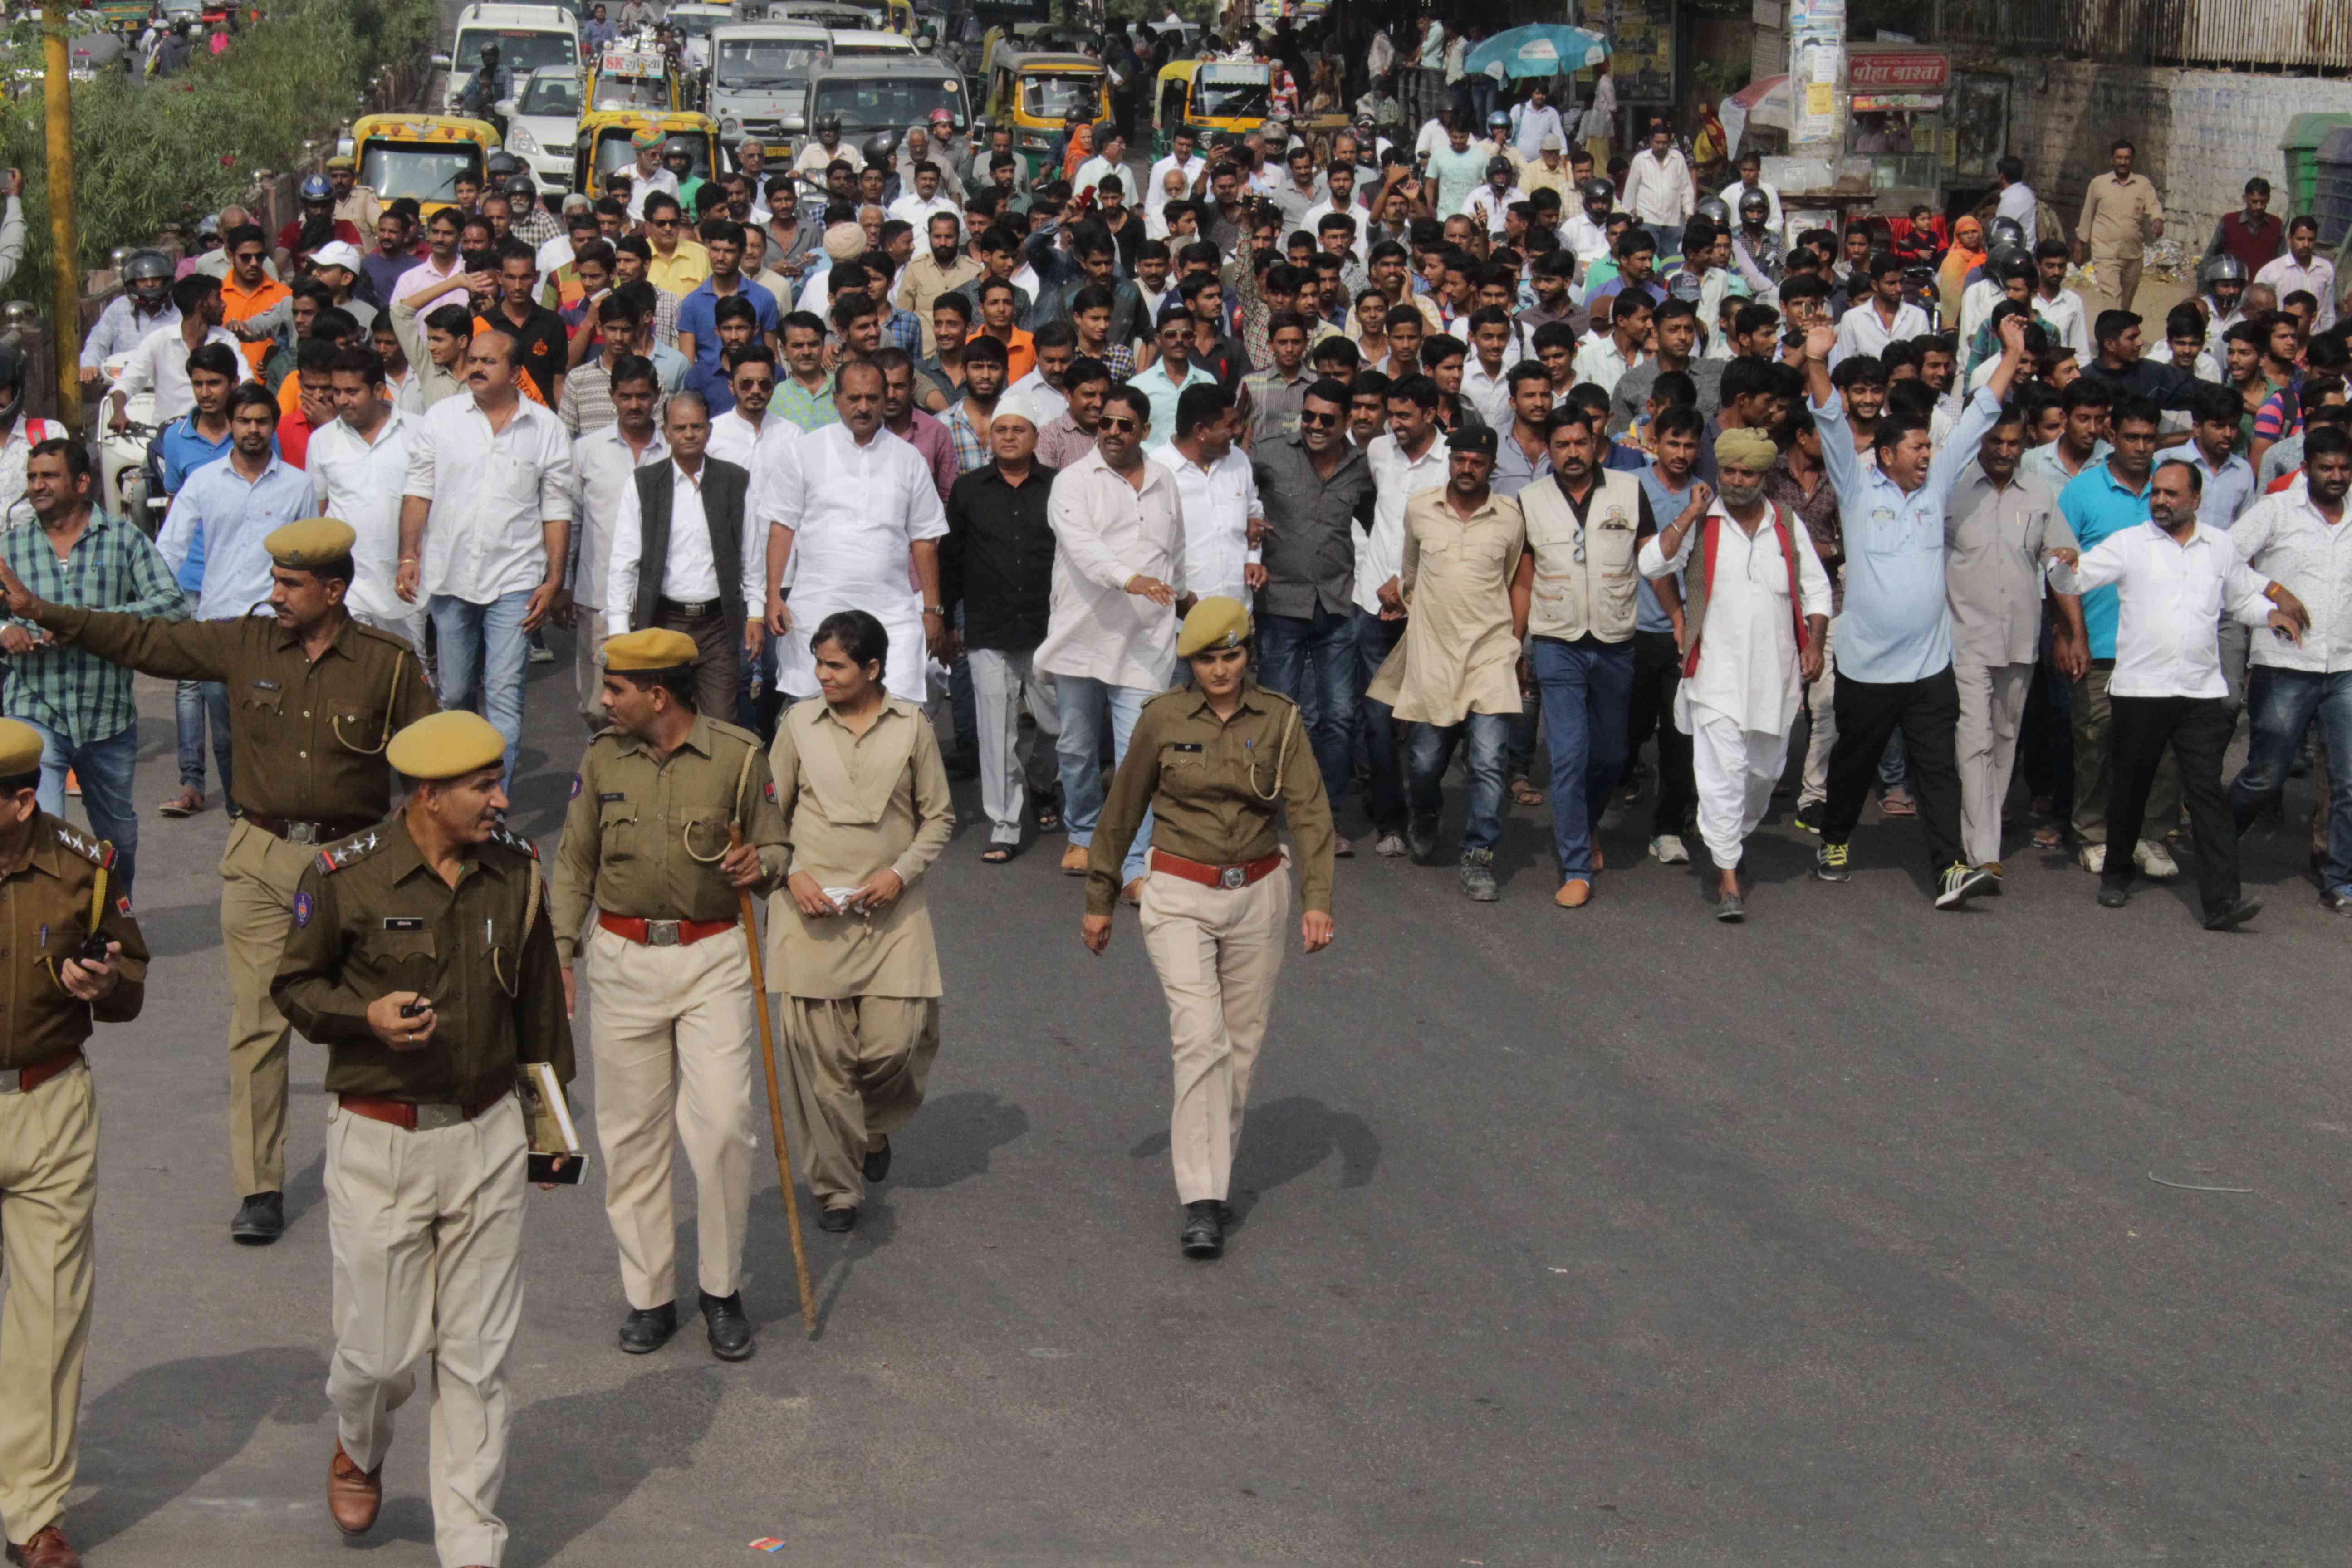 protest by Rajput community against film Padmavati in Jodhpur